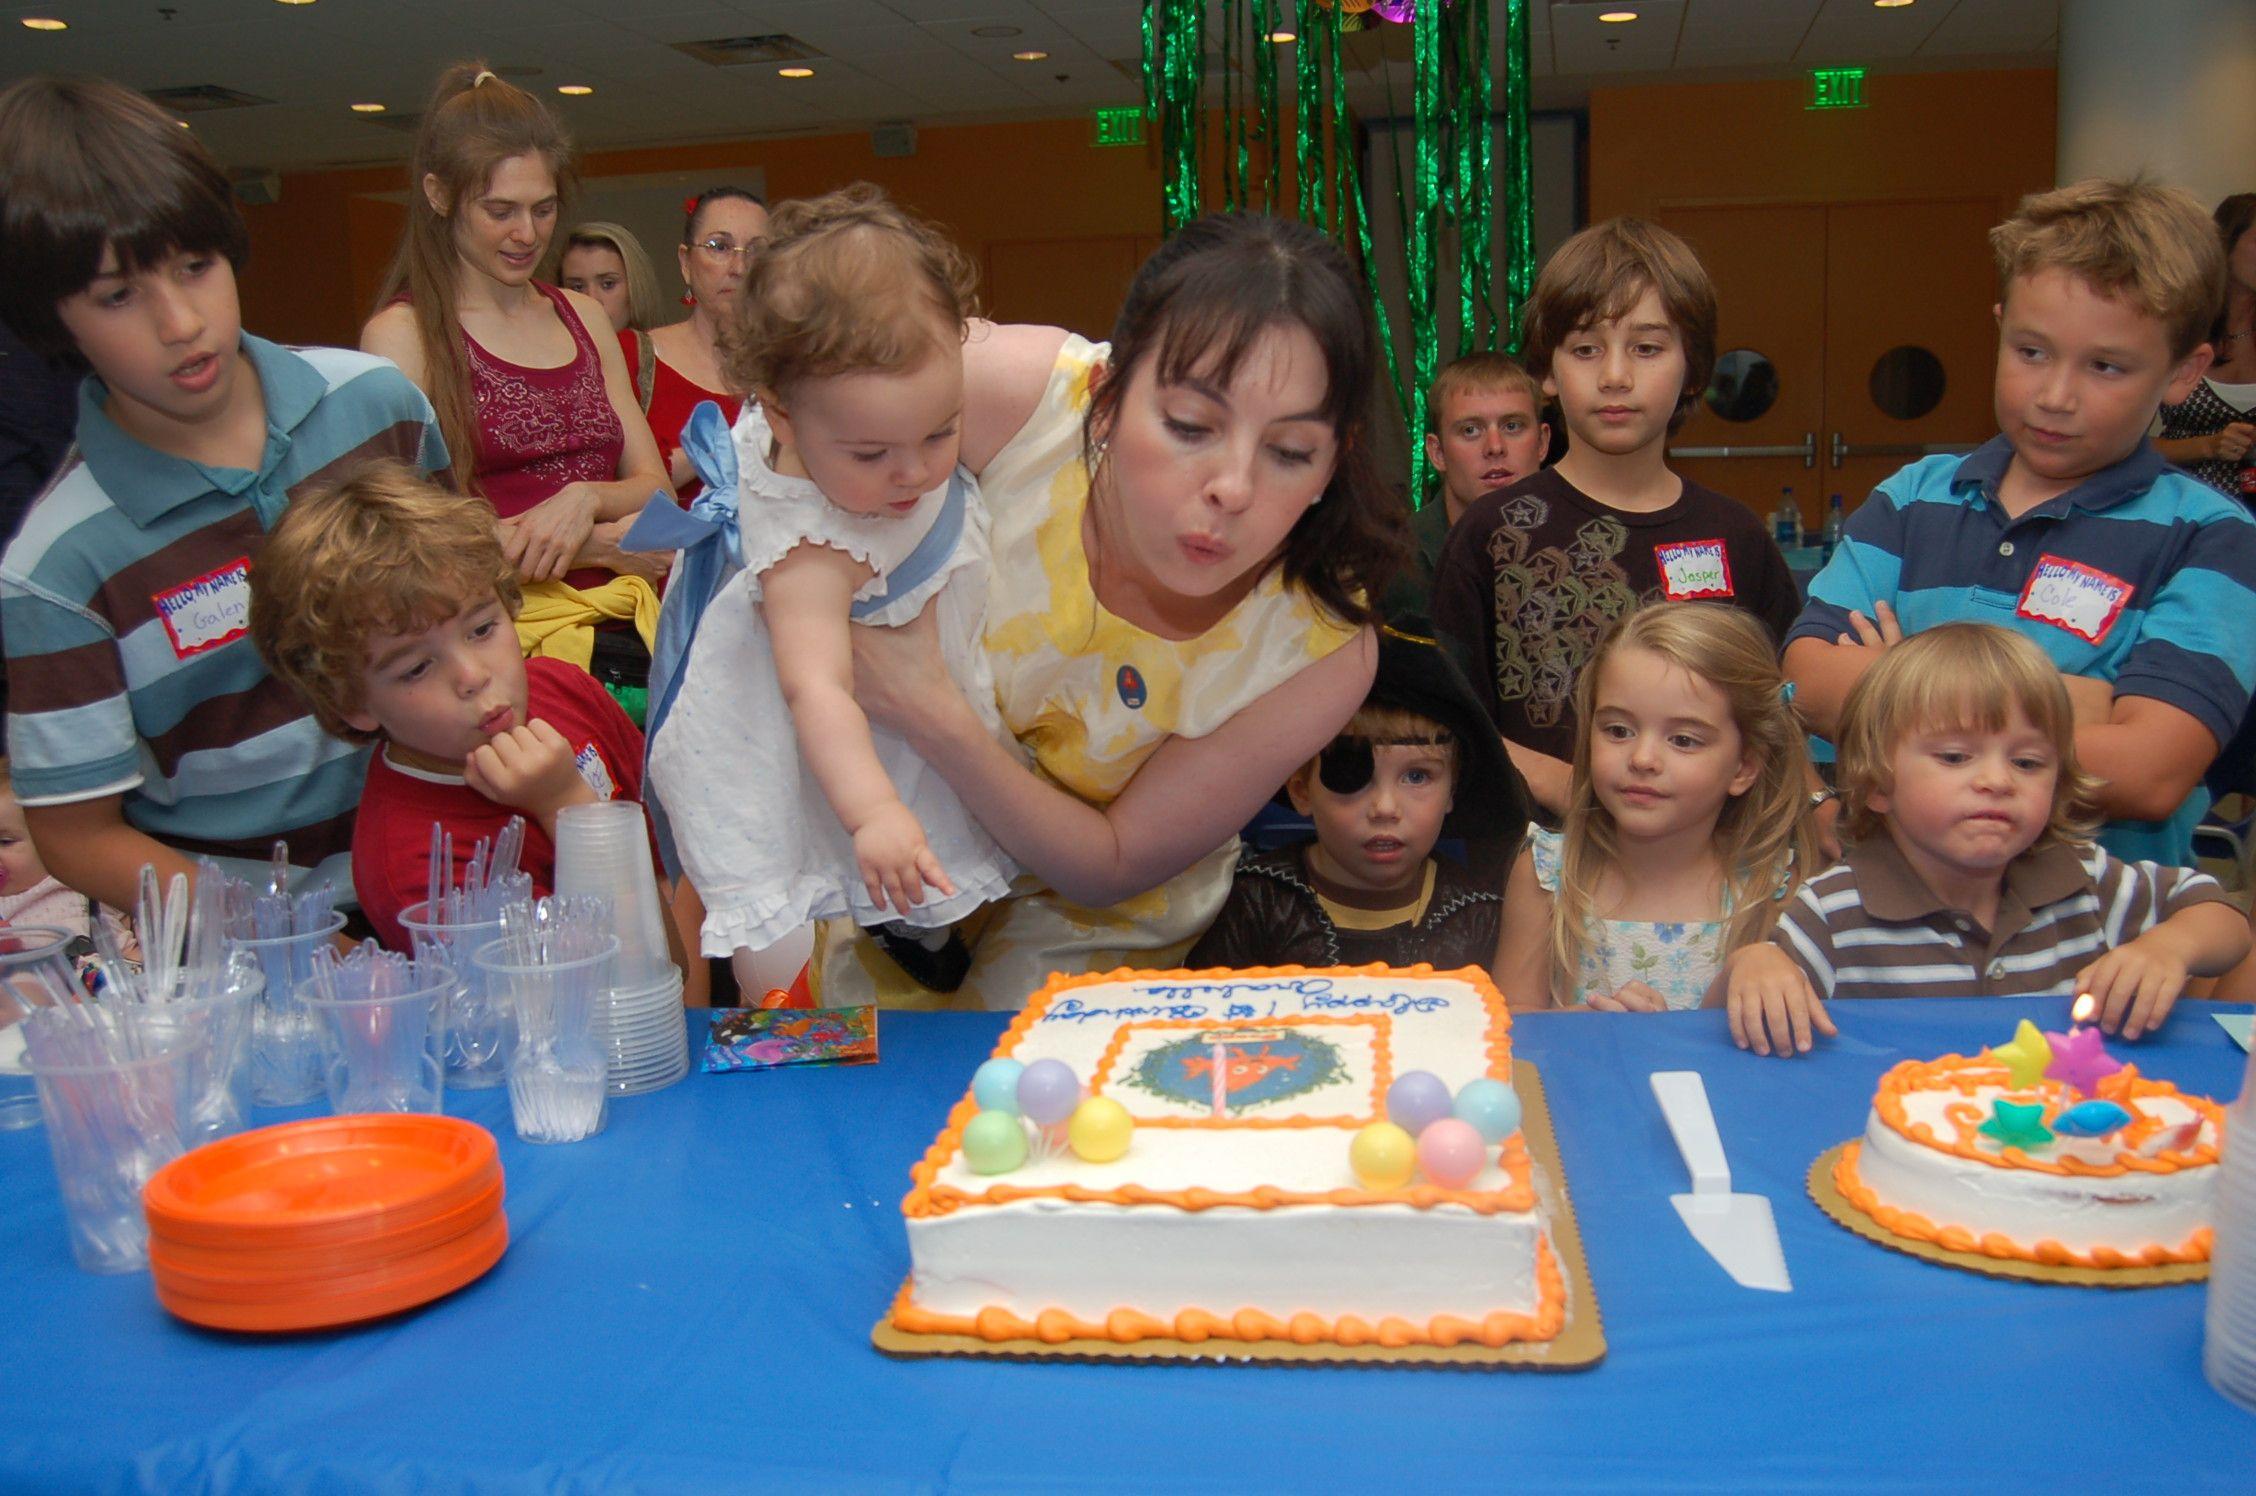 Atlanta Birthday Parties At Georgia Aquarium Enjoyable Events - Children's birthday party atlanta